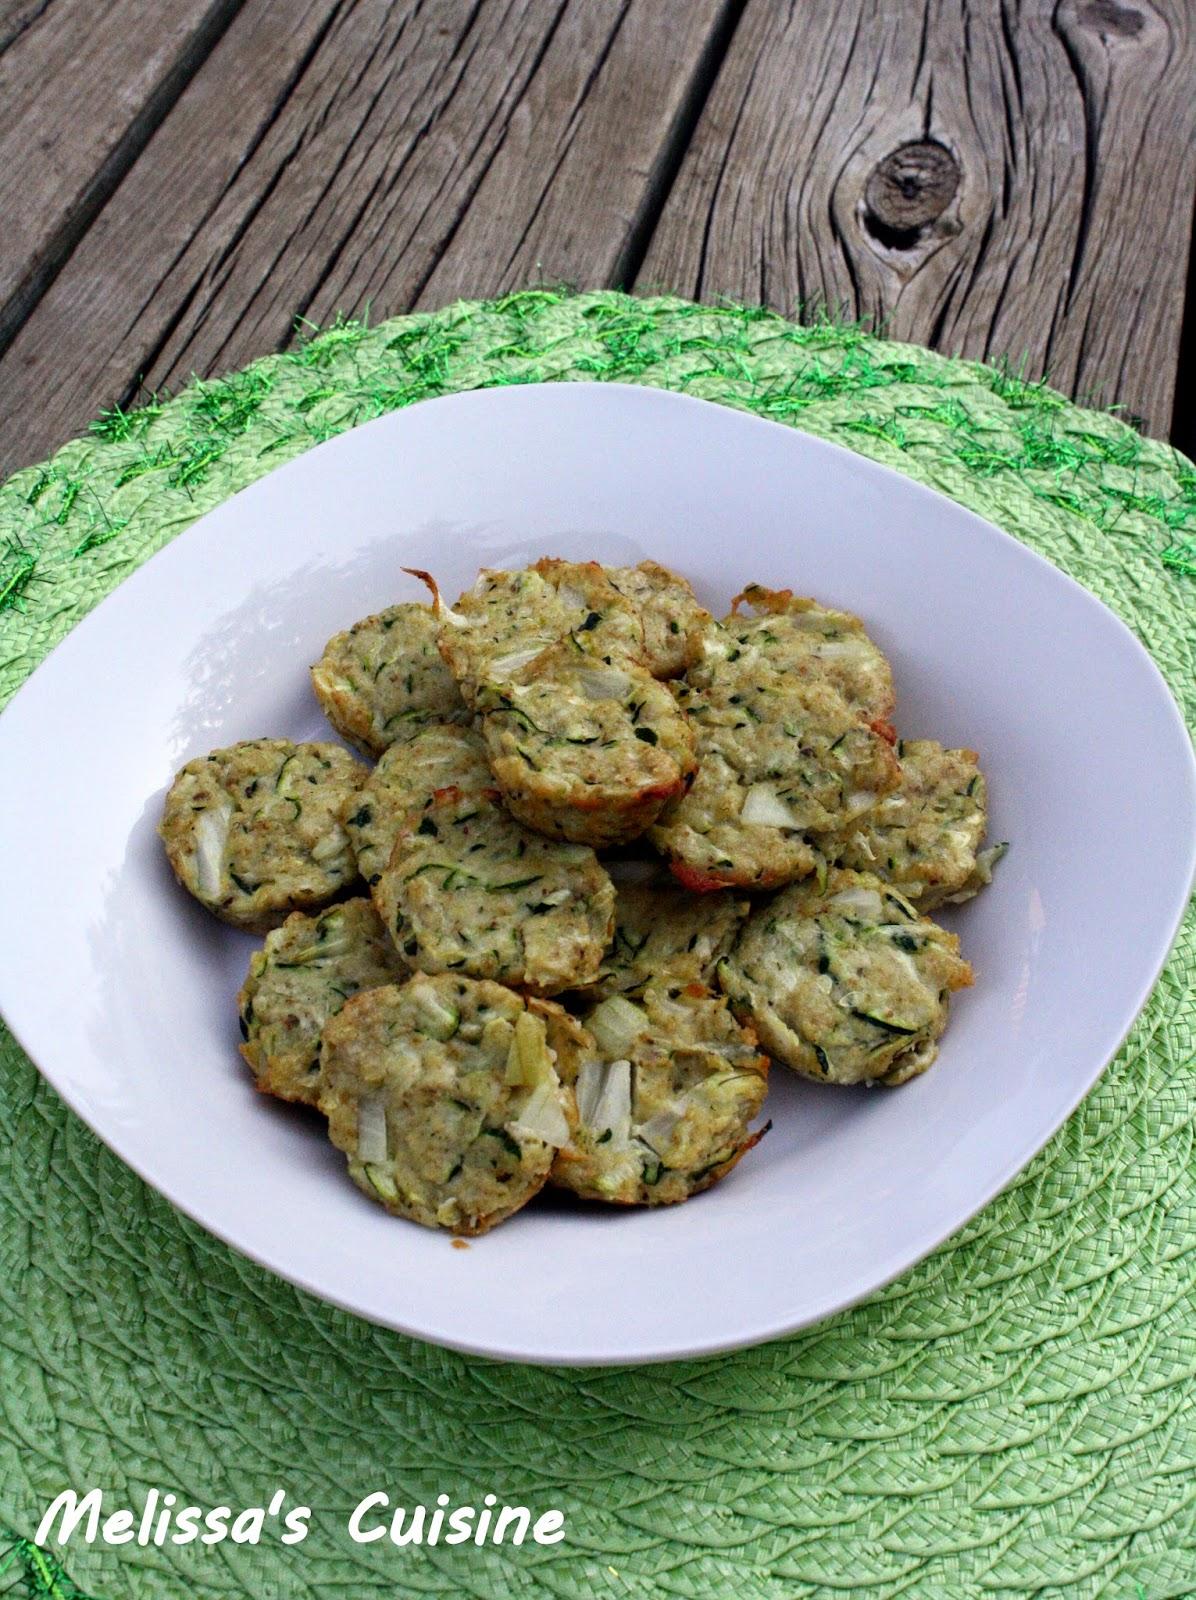 Melissa's Cuisine: Zucchini Bites